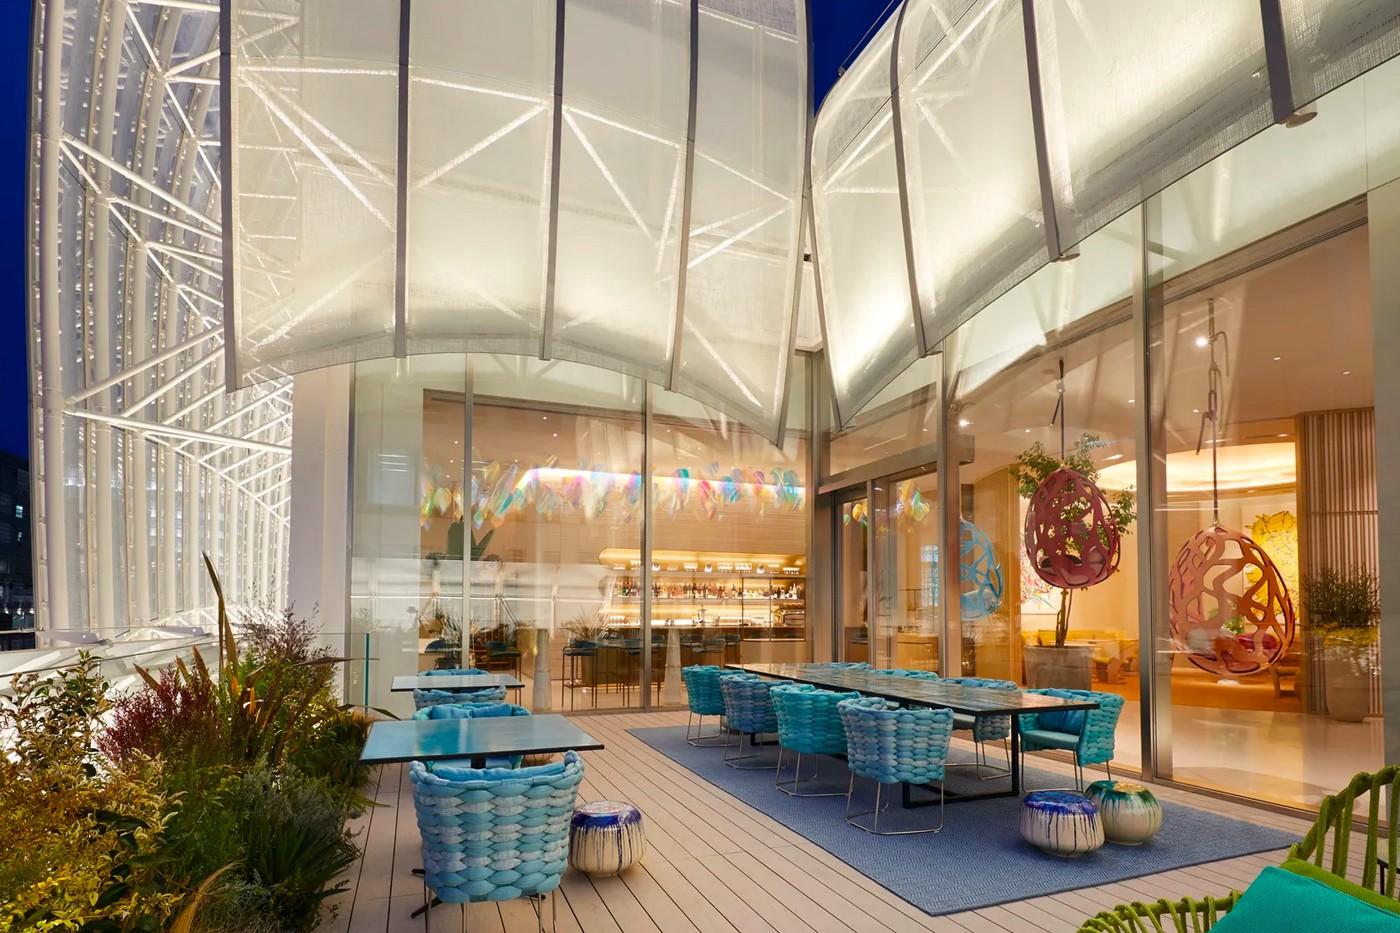 Louis Vuitton restaurant 5